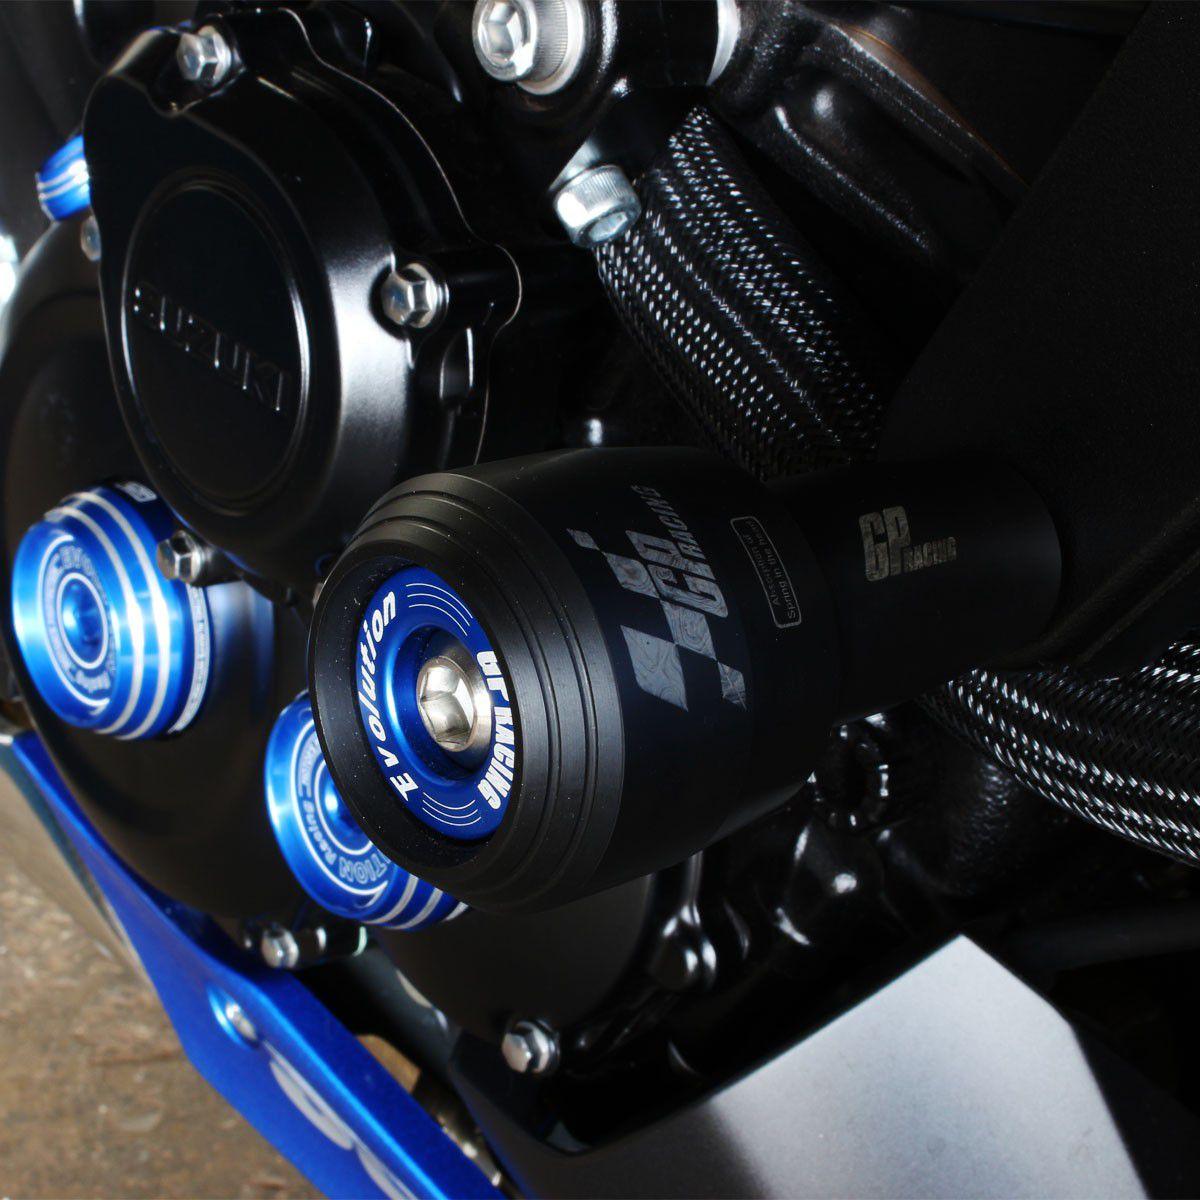 Slider Evolution GP Nylon Bmw F800R F800 R 10 11 12 13 14 15